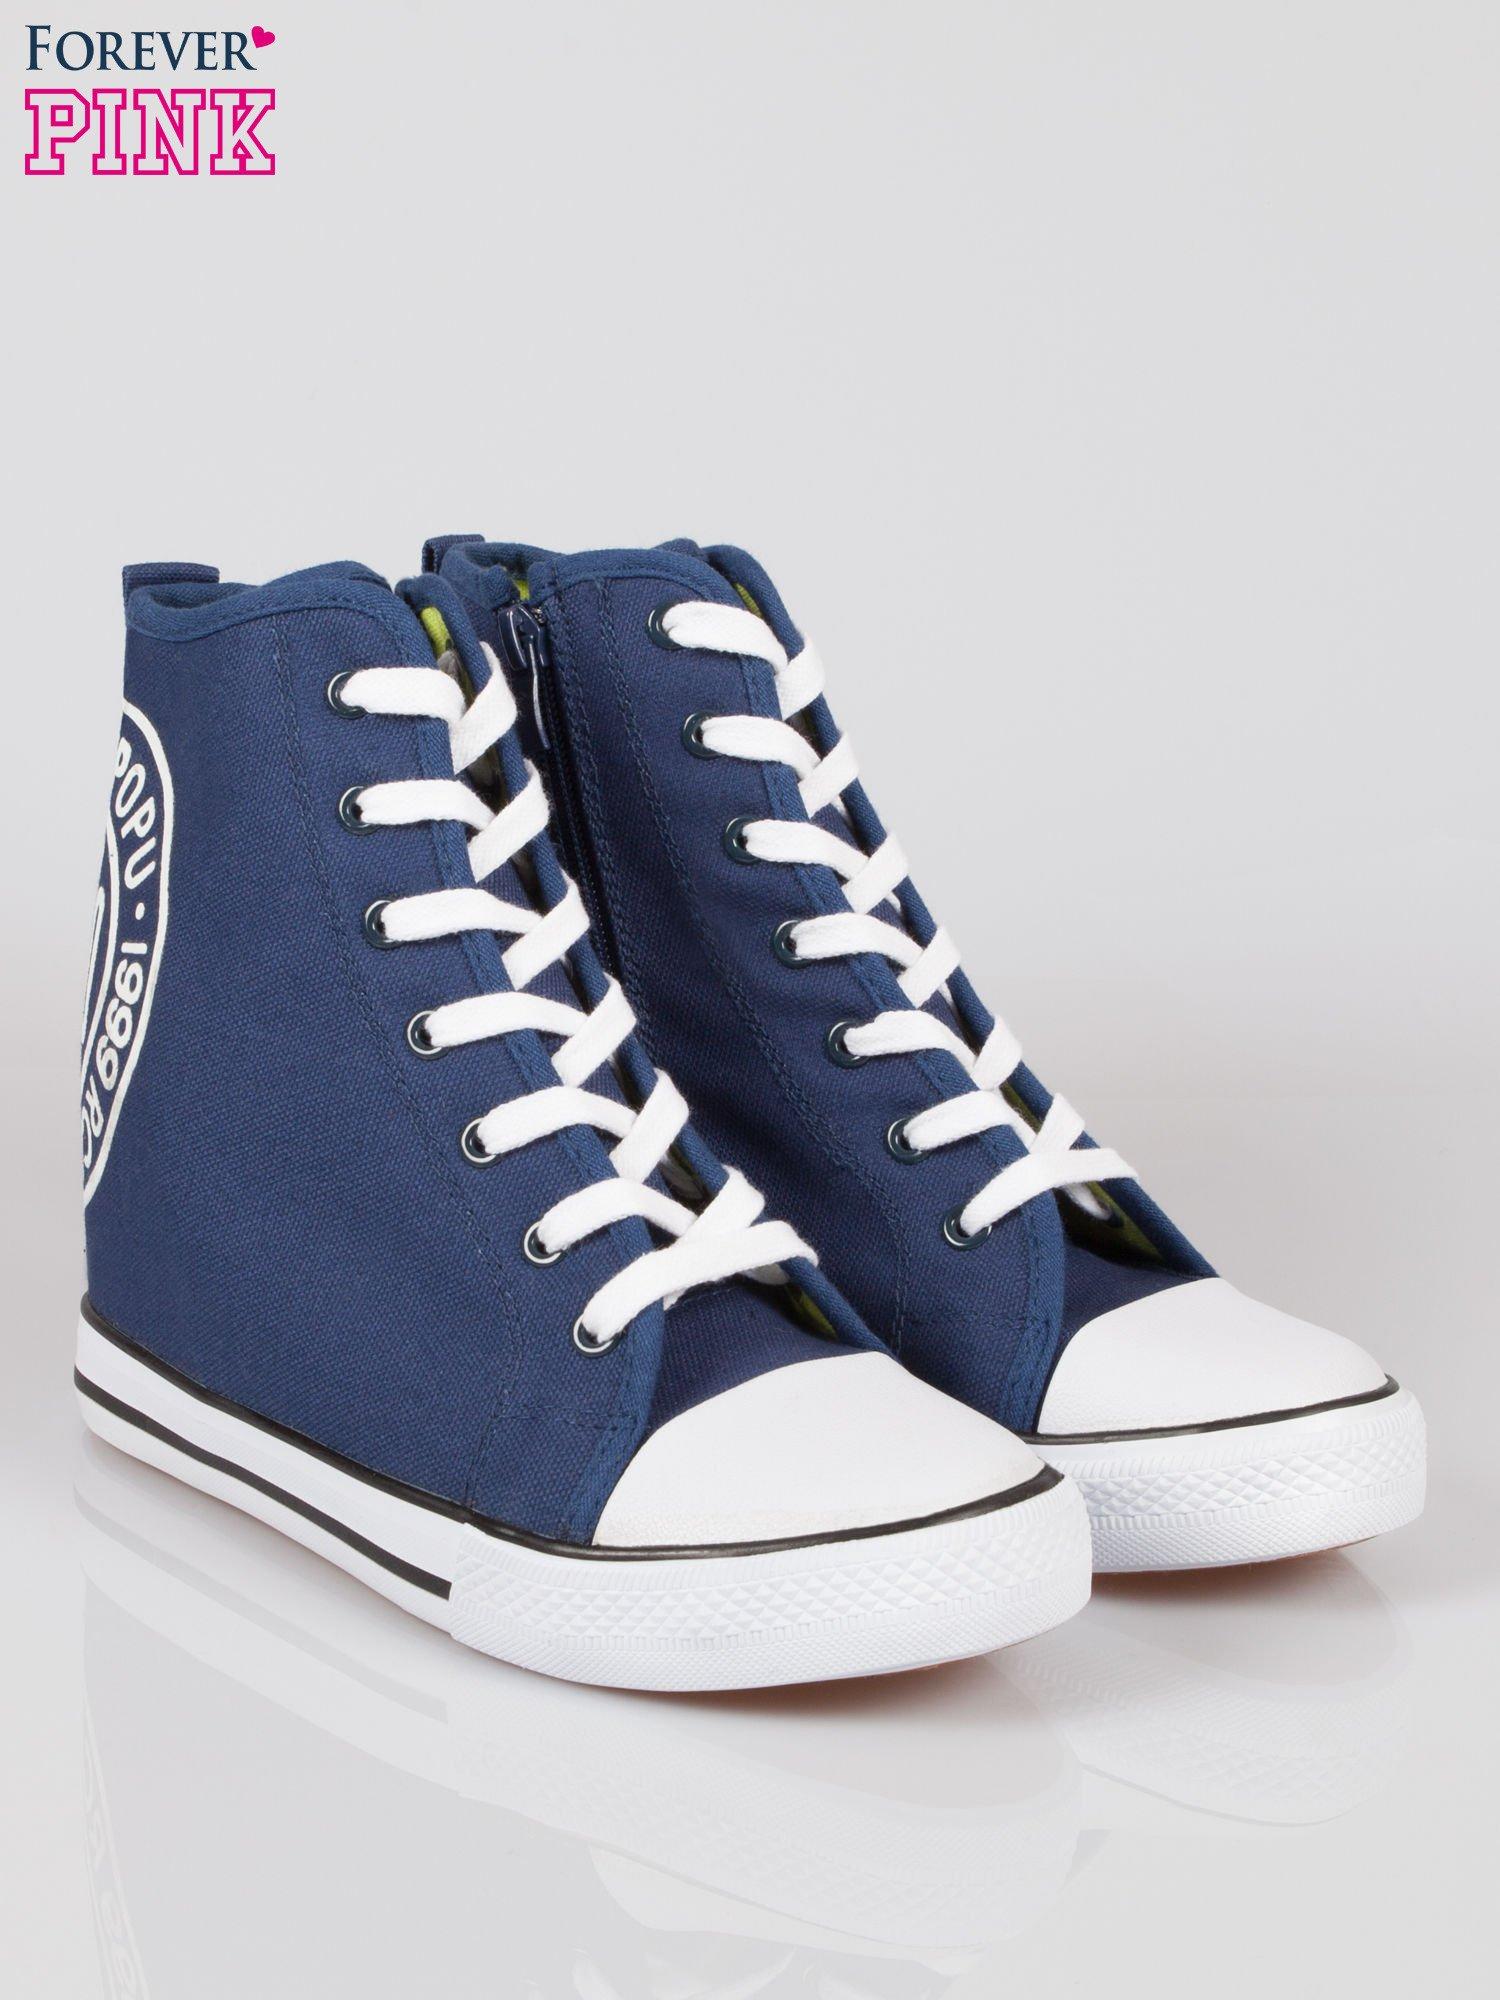 Granatowe trampki na koturnie sneakersy z logo                                  zdj.                                  2